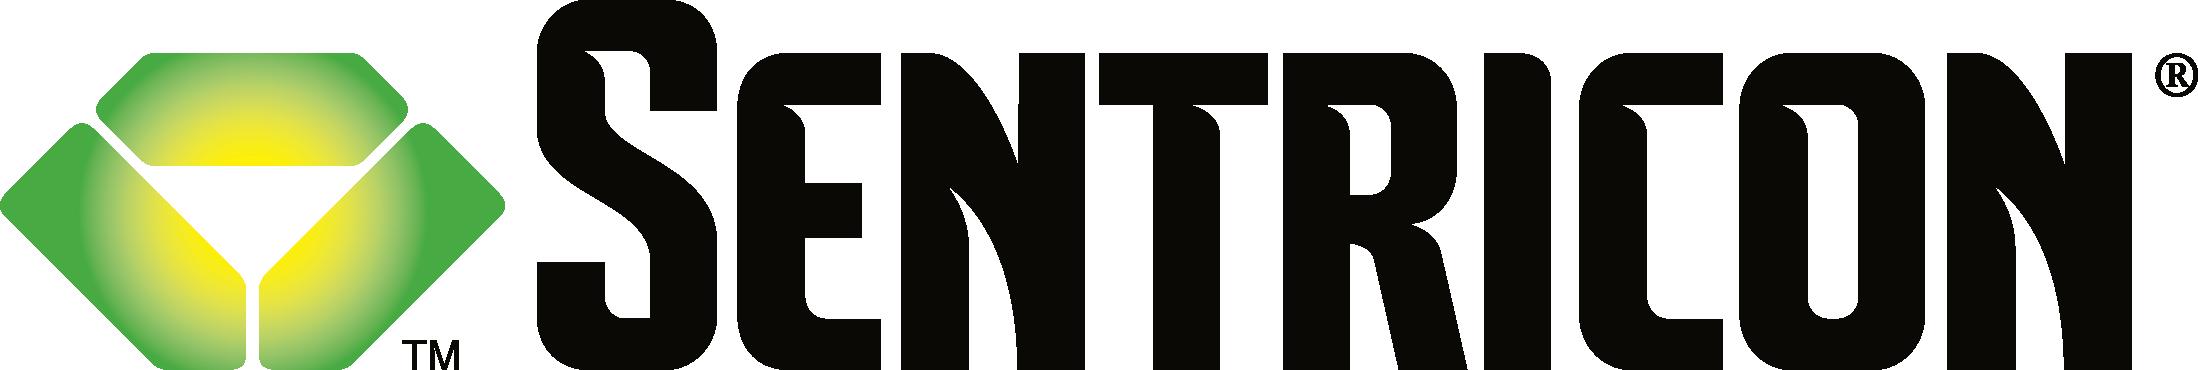 Sentricon logo PMS